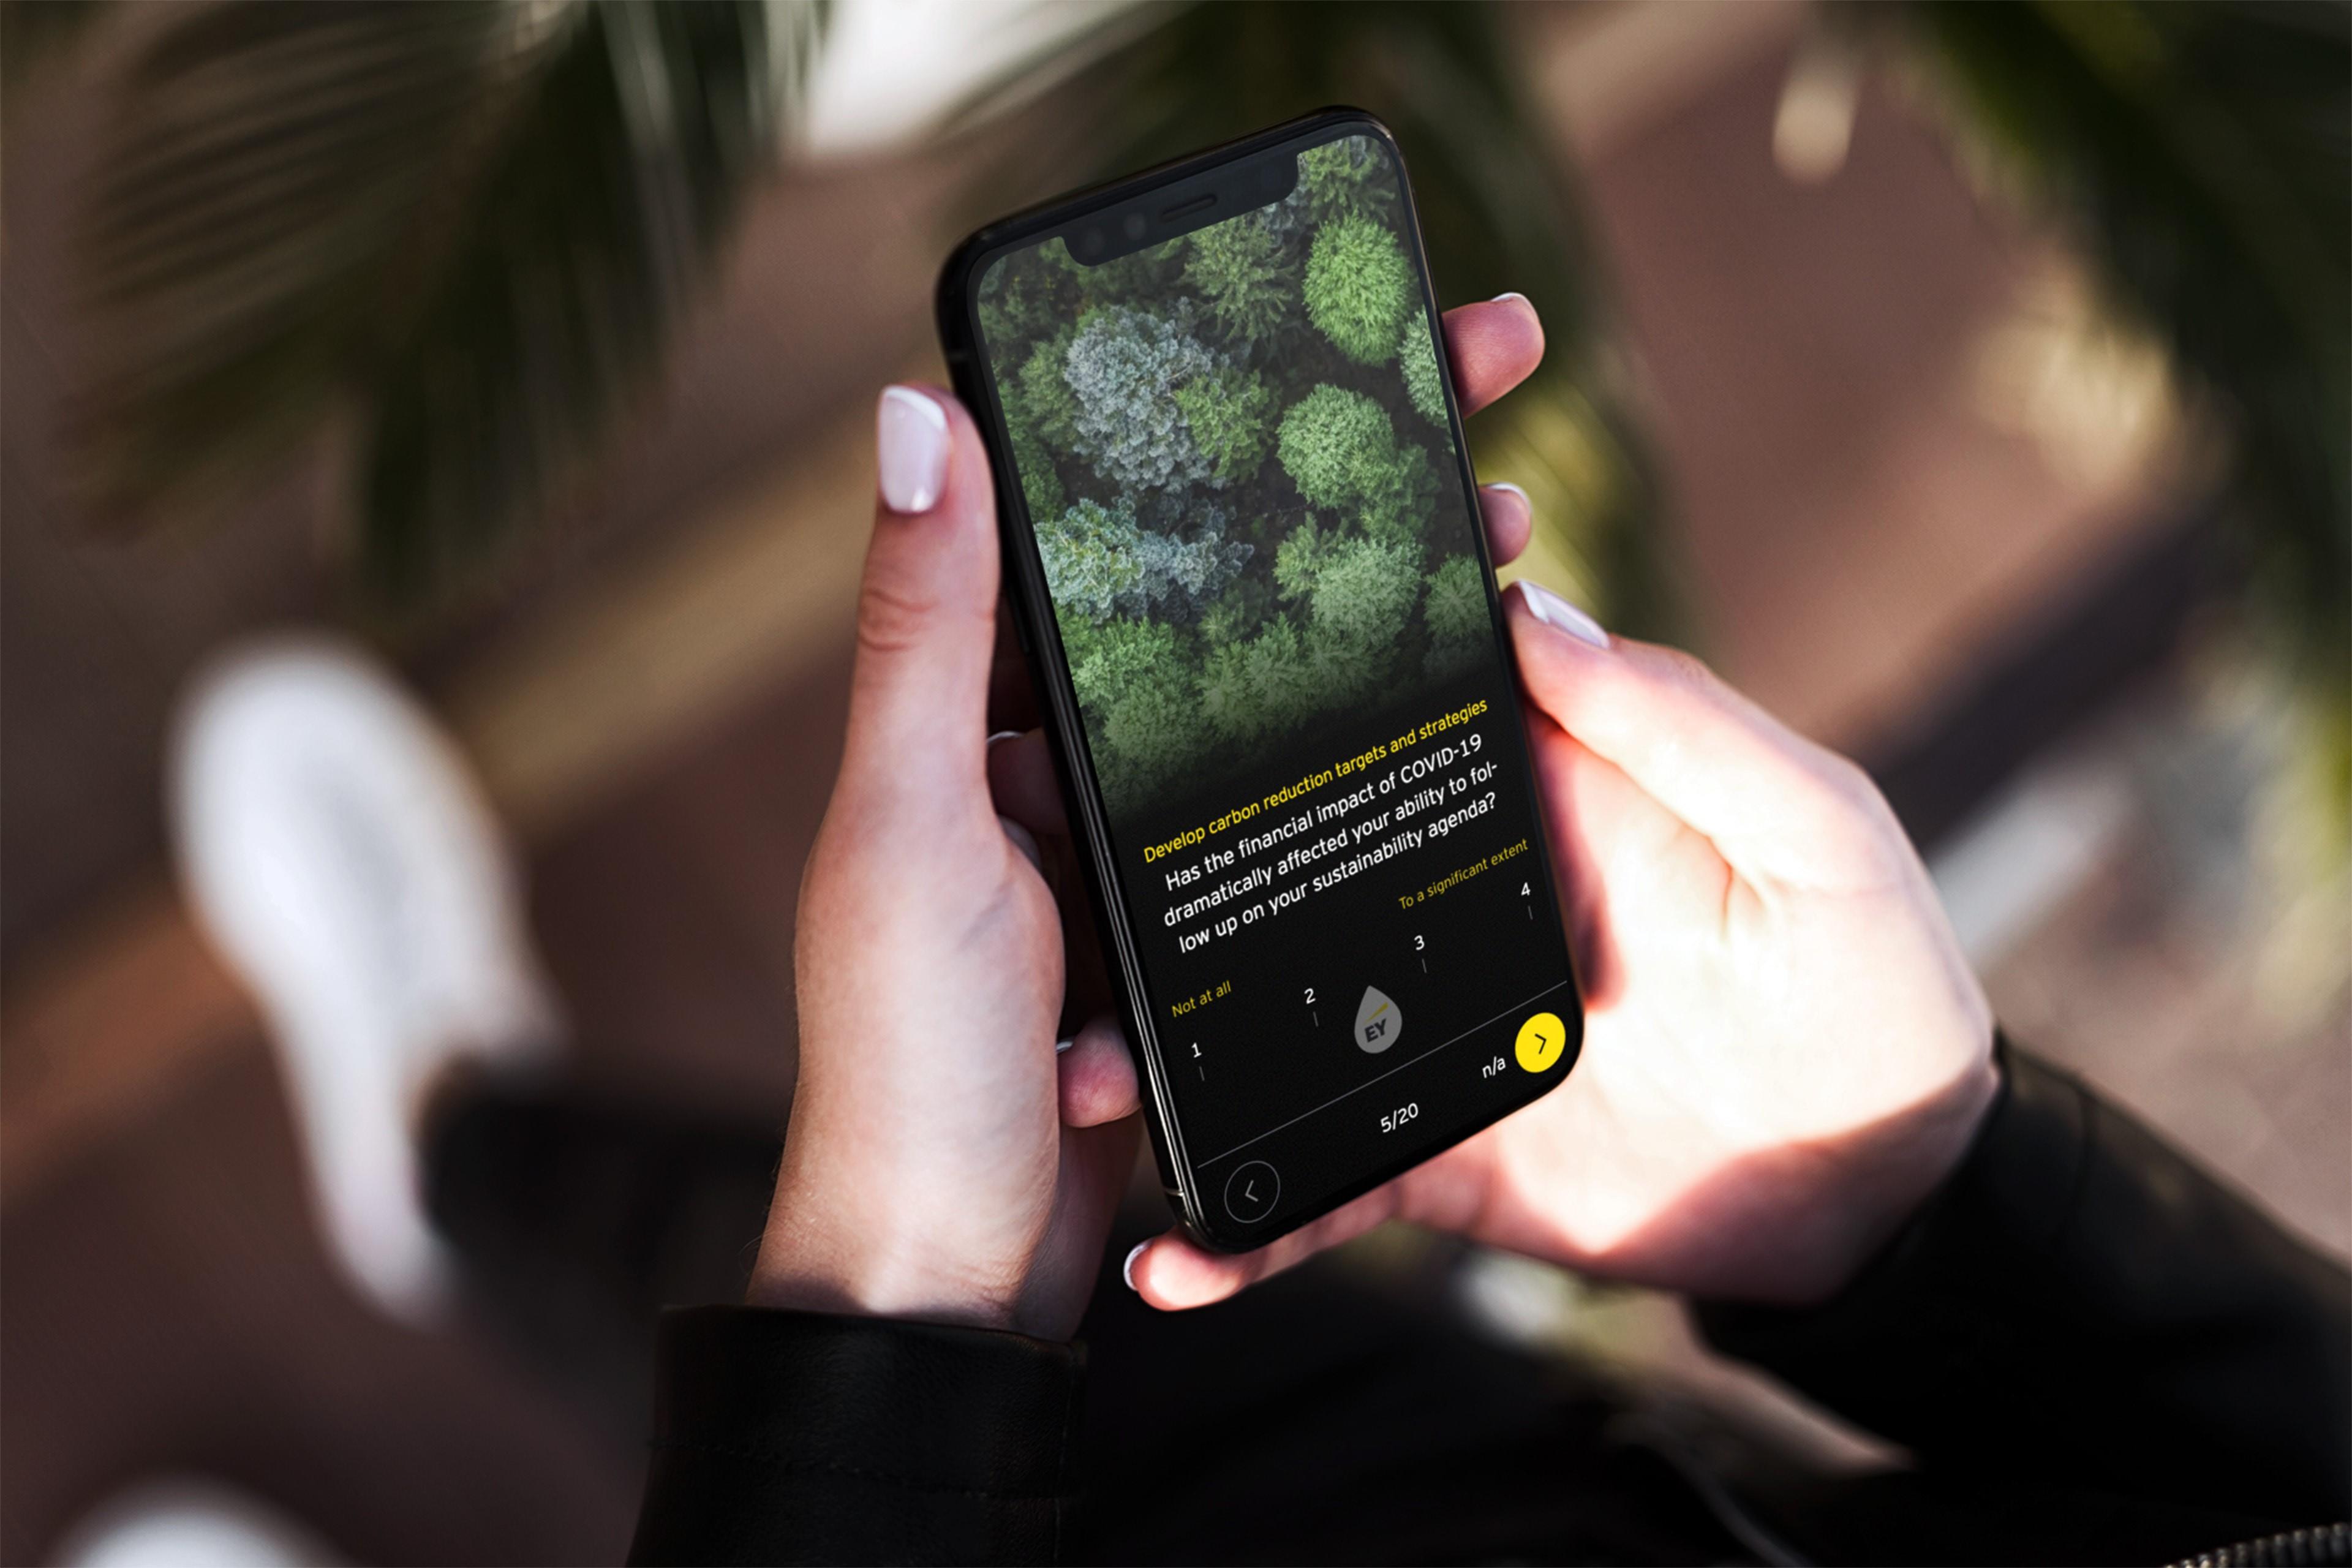 Women using mobile